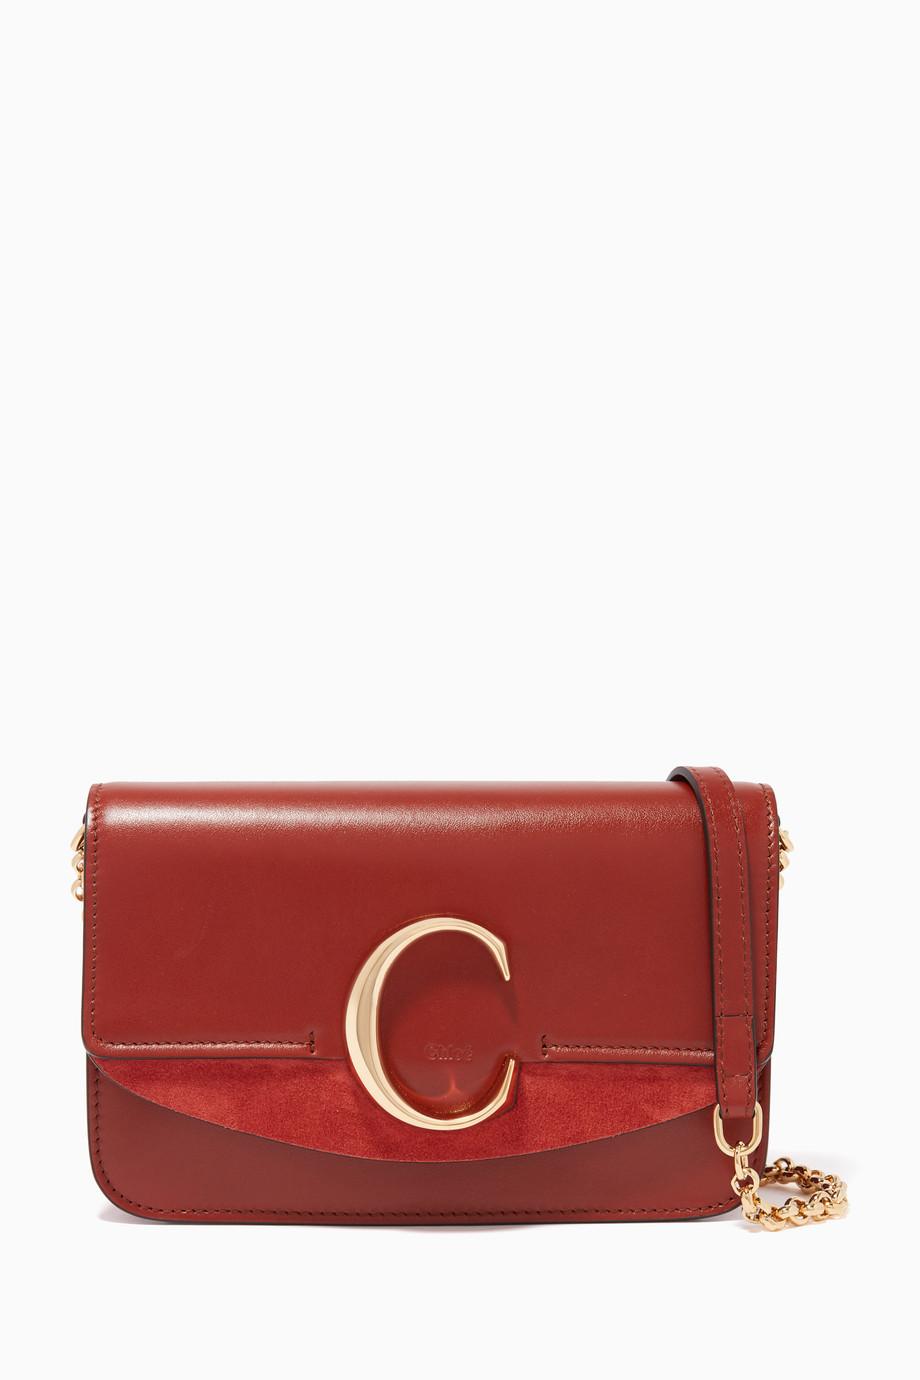 5ce58ece51e Shop Chloé Brown Chloé 'C' Leather Clutch for Women   Ounass